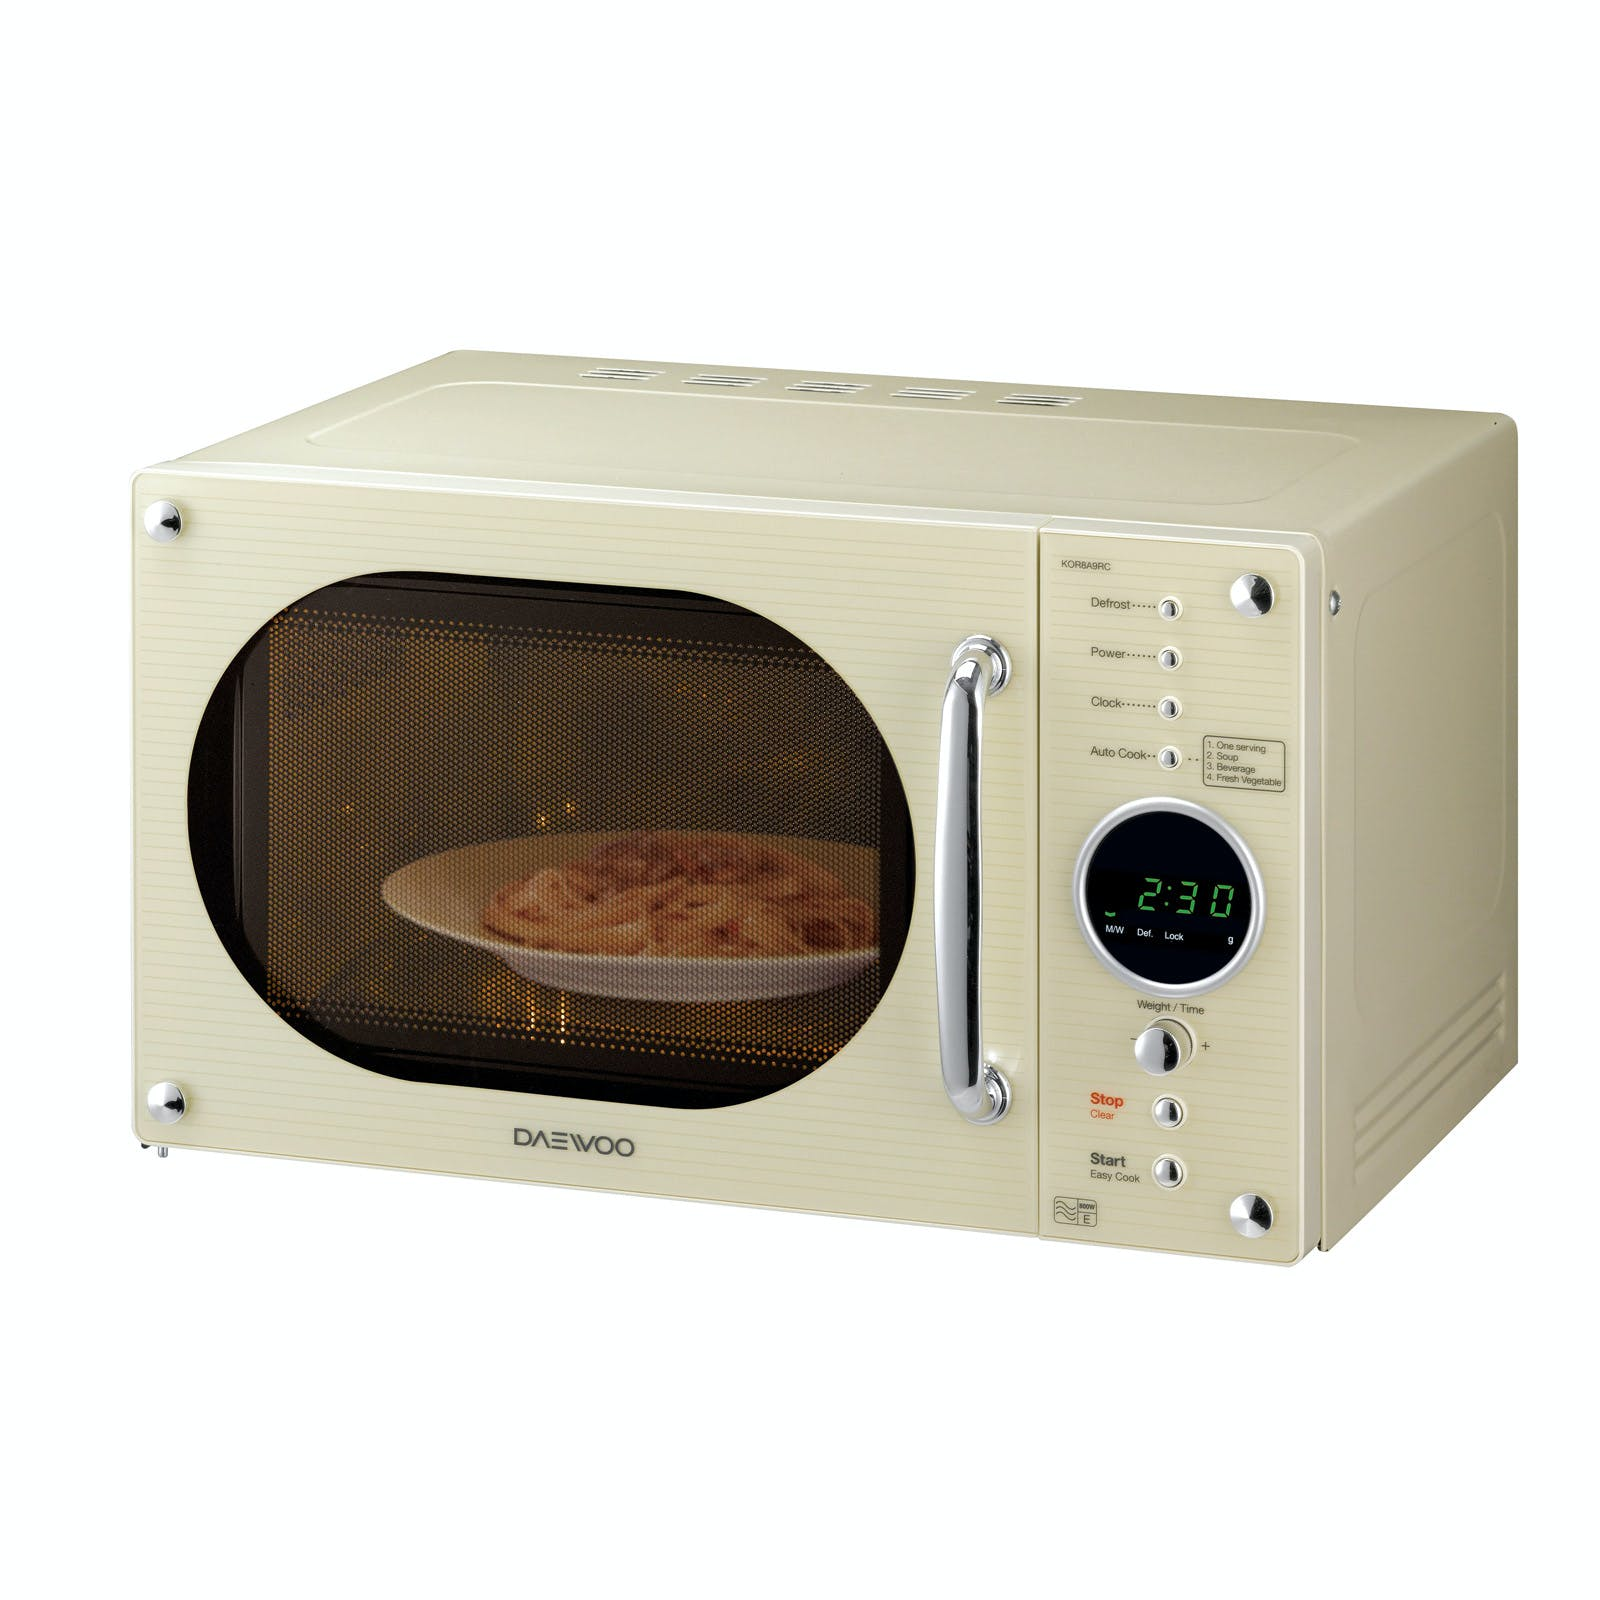 Retro Microwave Ovens Bestmicrowave